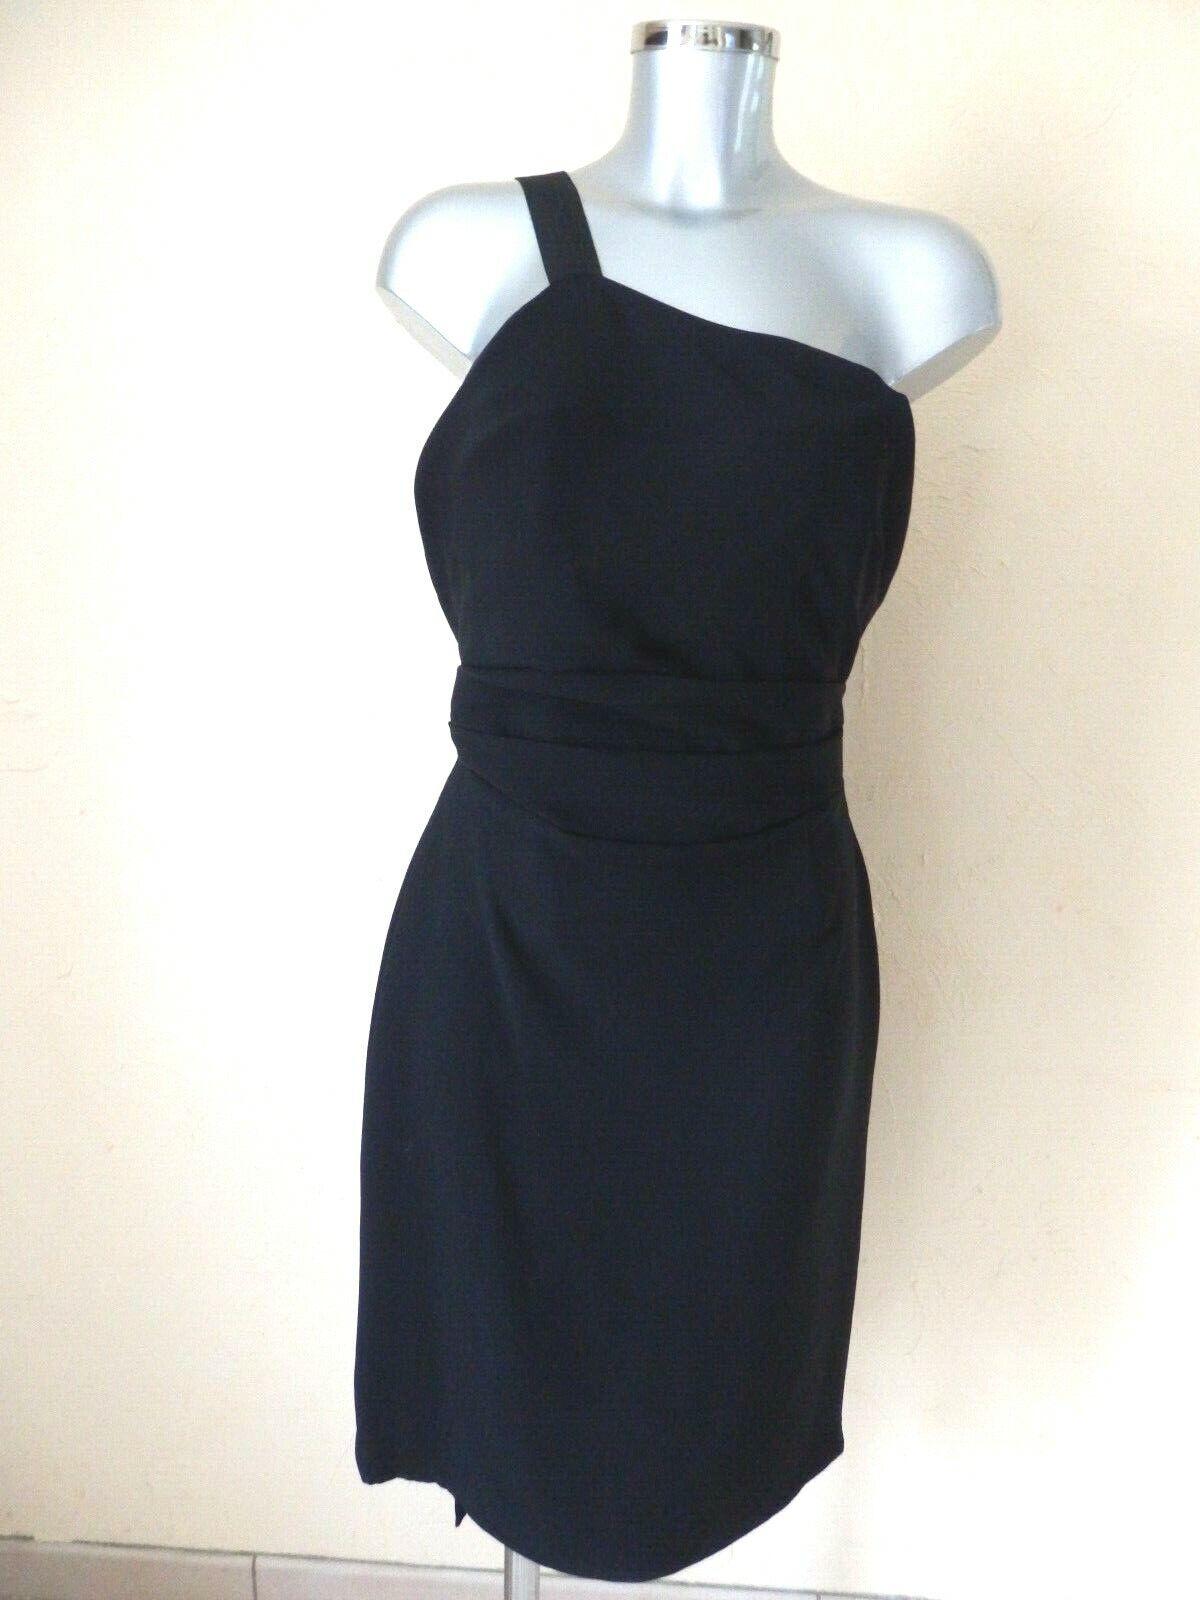 GIVENCHY - Robe 1 bretelle - 100% soie blacke - T.42fr - AUTHENTIQUE